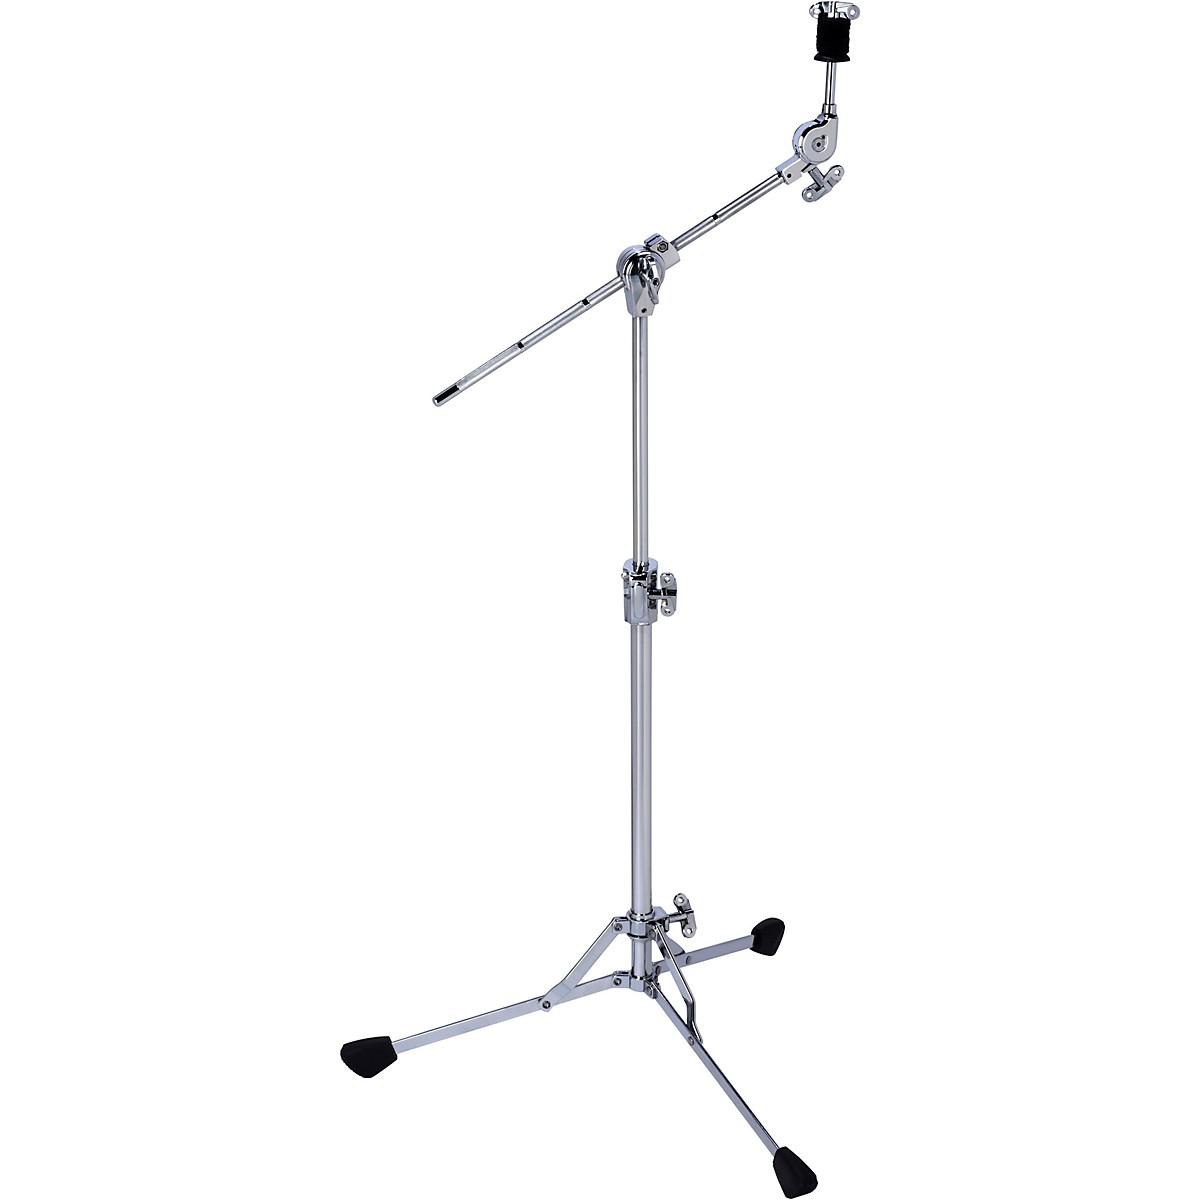 ddrum Mercury Flat Based 2-Tier Boom Stand